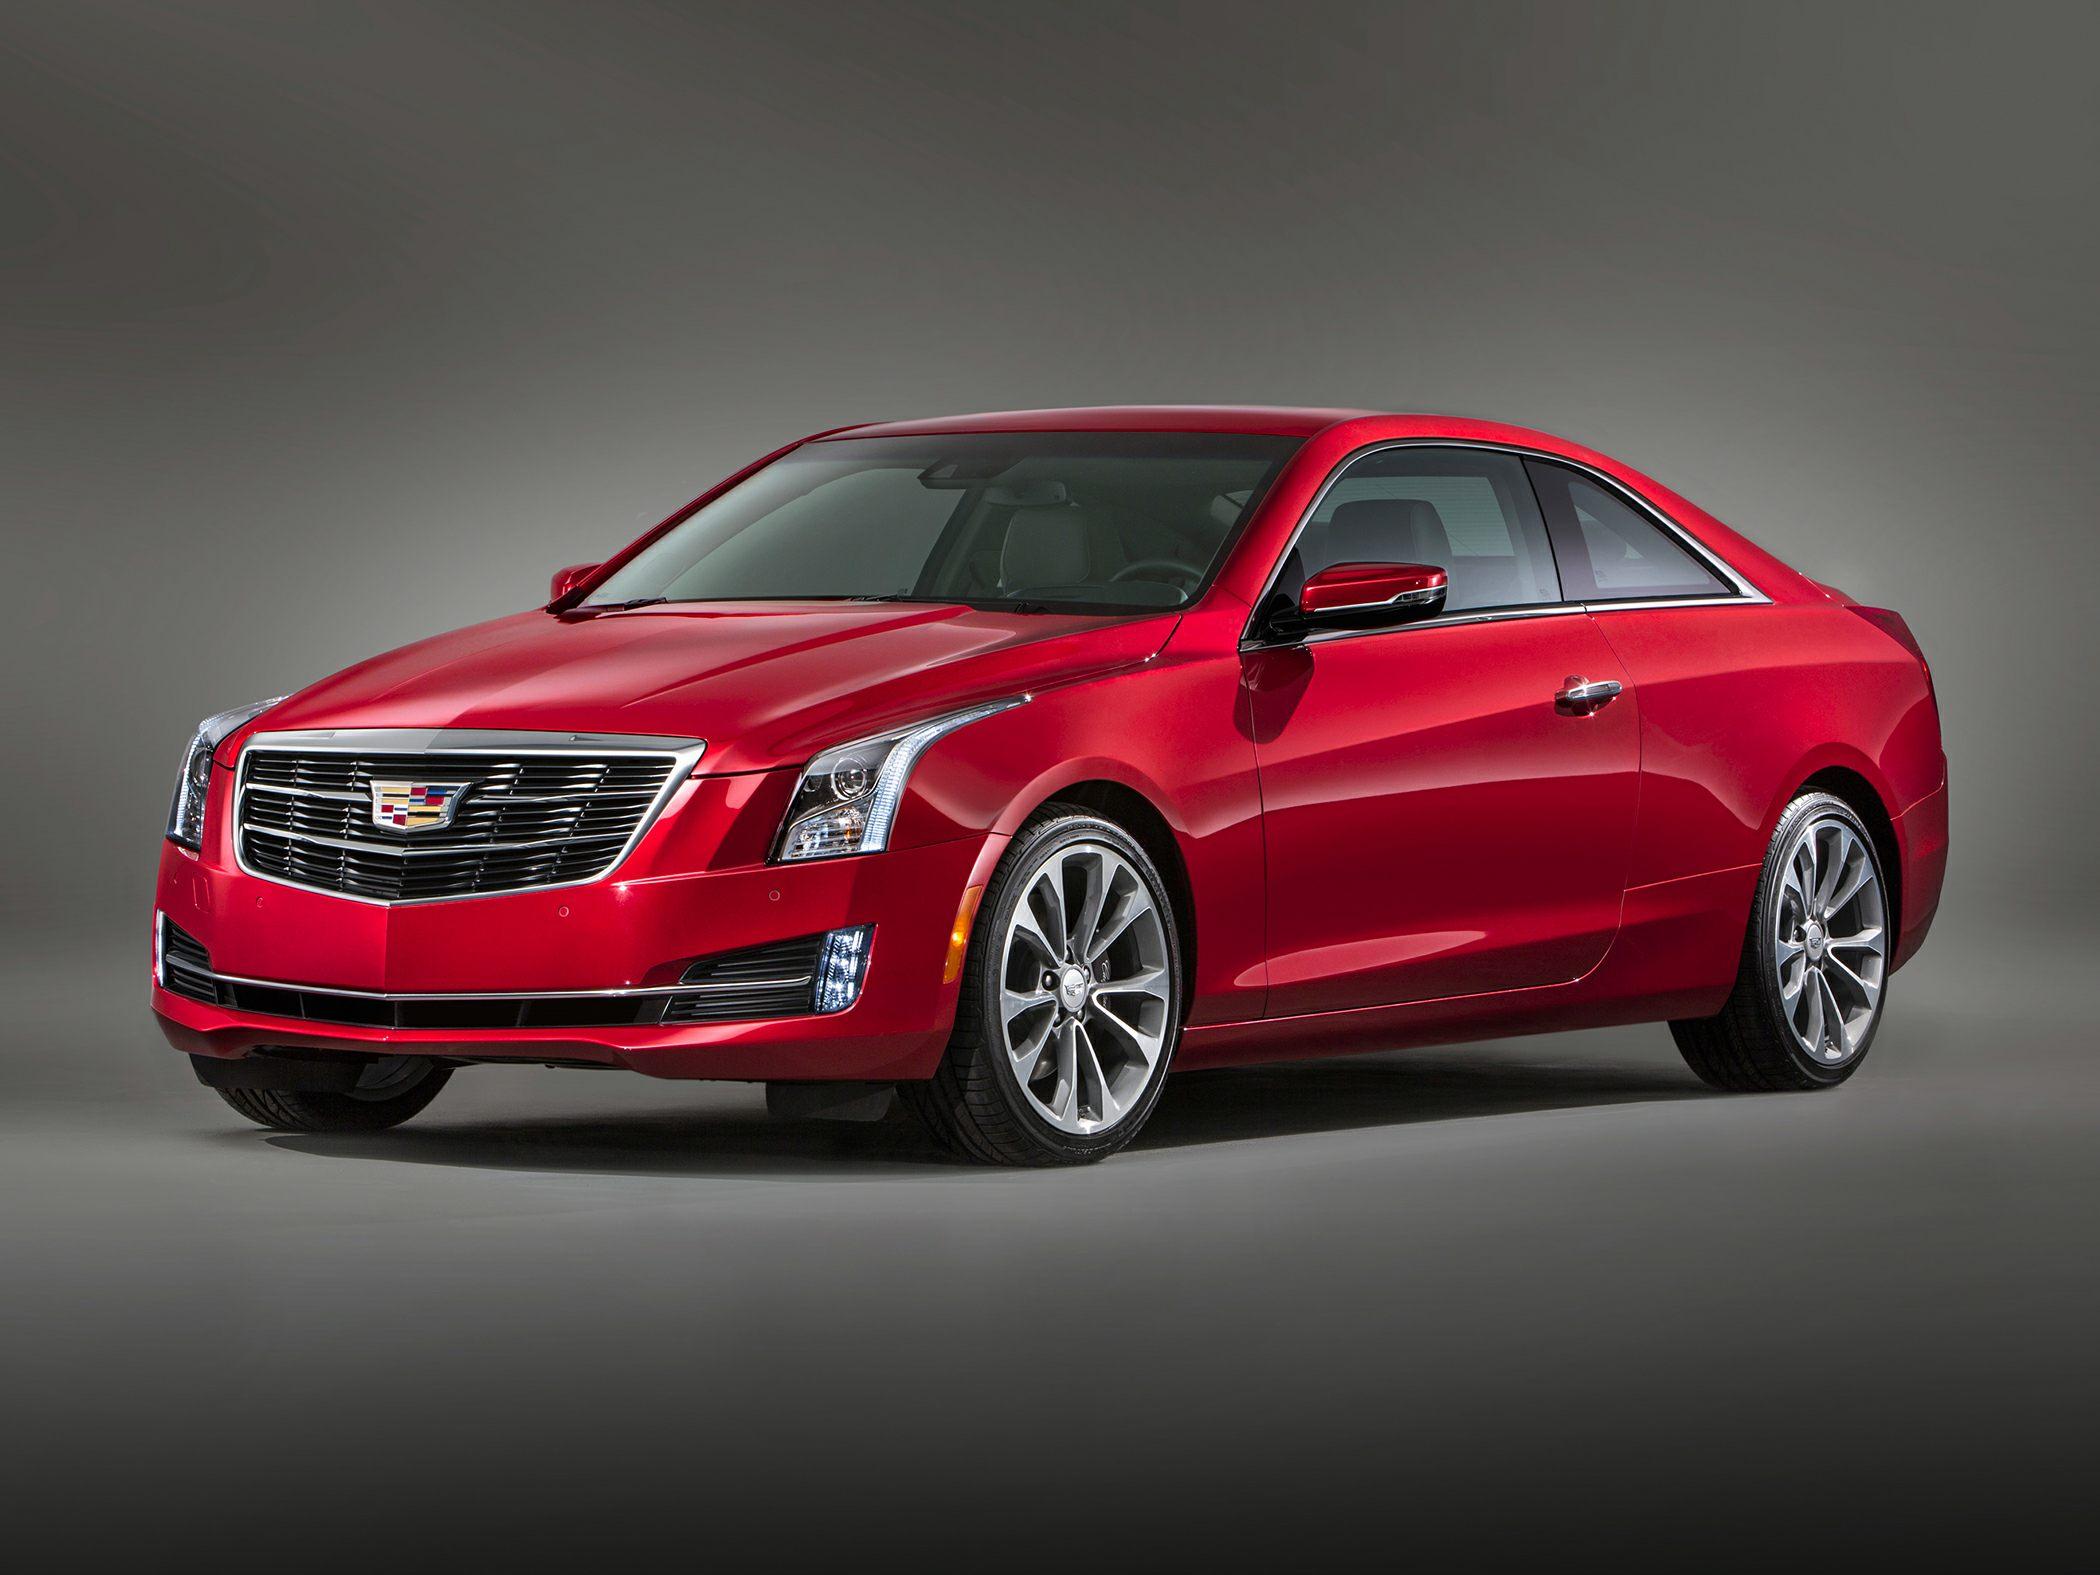 2019 Cadillac Ats New Car Test Drive